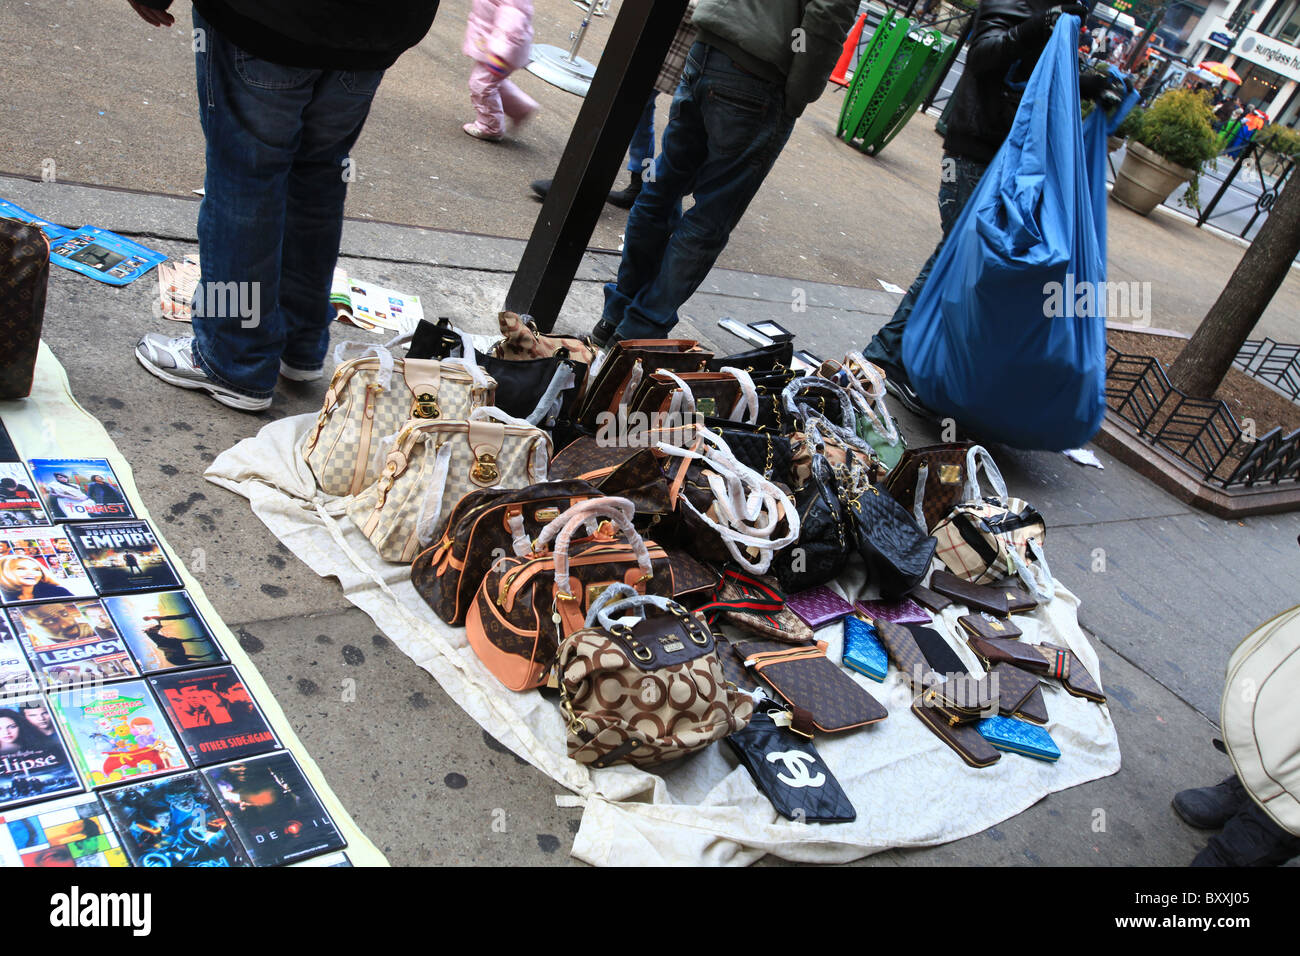 Counterfeit fake designer handbags on sale on sidewalk in new york city 2010 stock